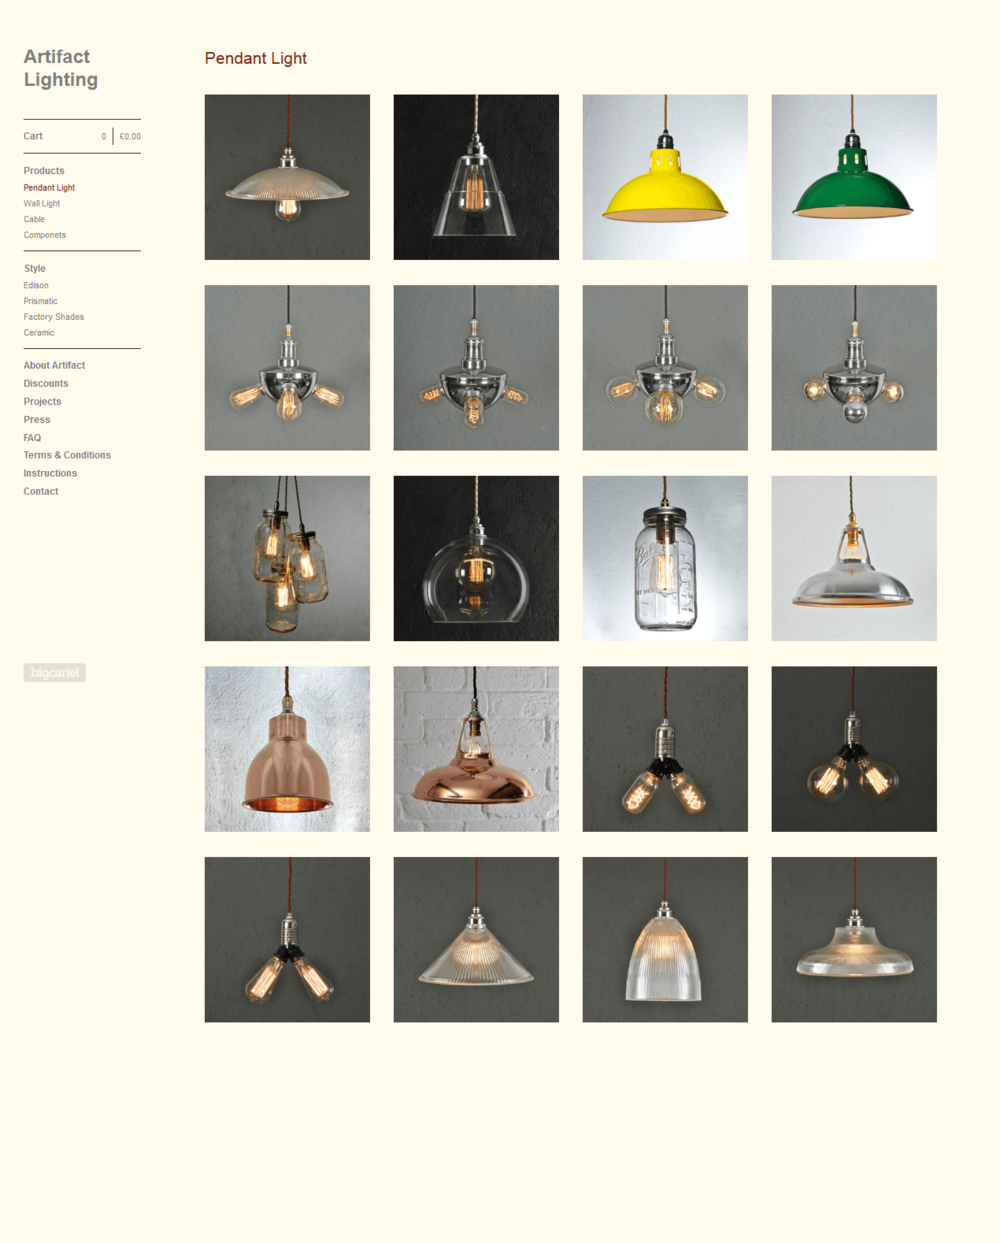 Artifact_Lighting_—_Pendant_Light_-_2014-12-04_12.03.18.png